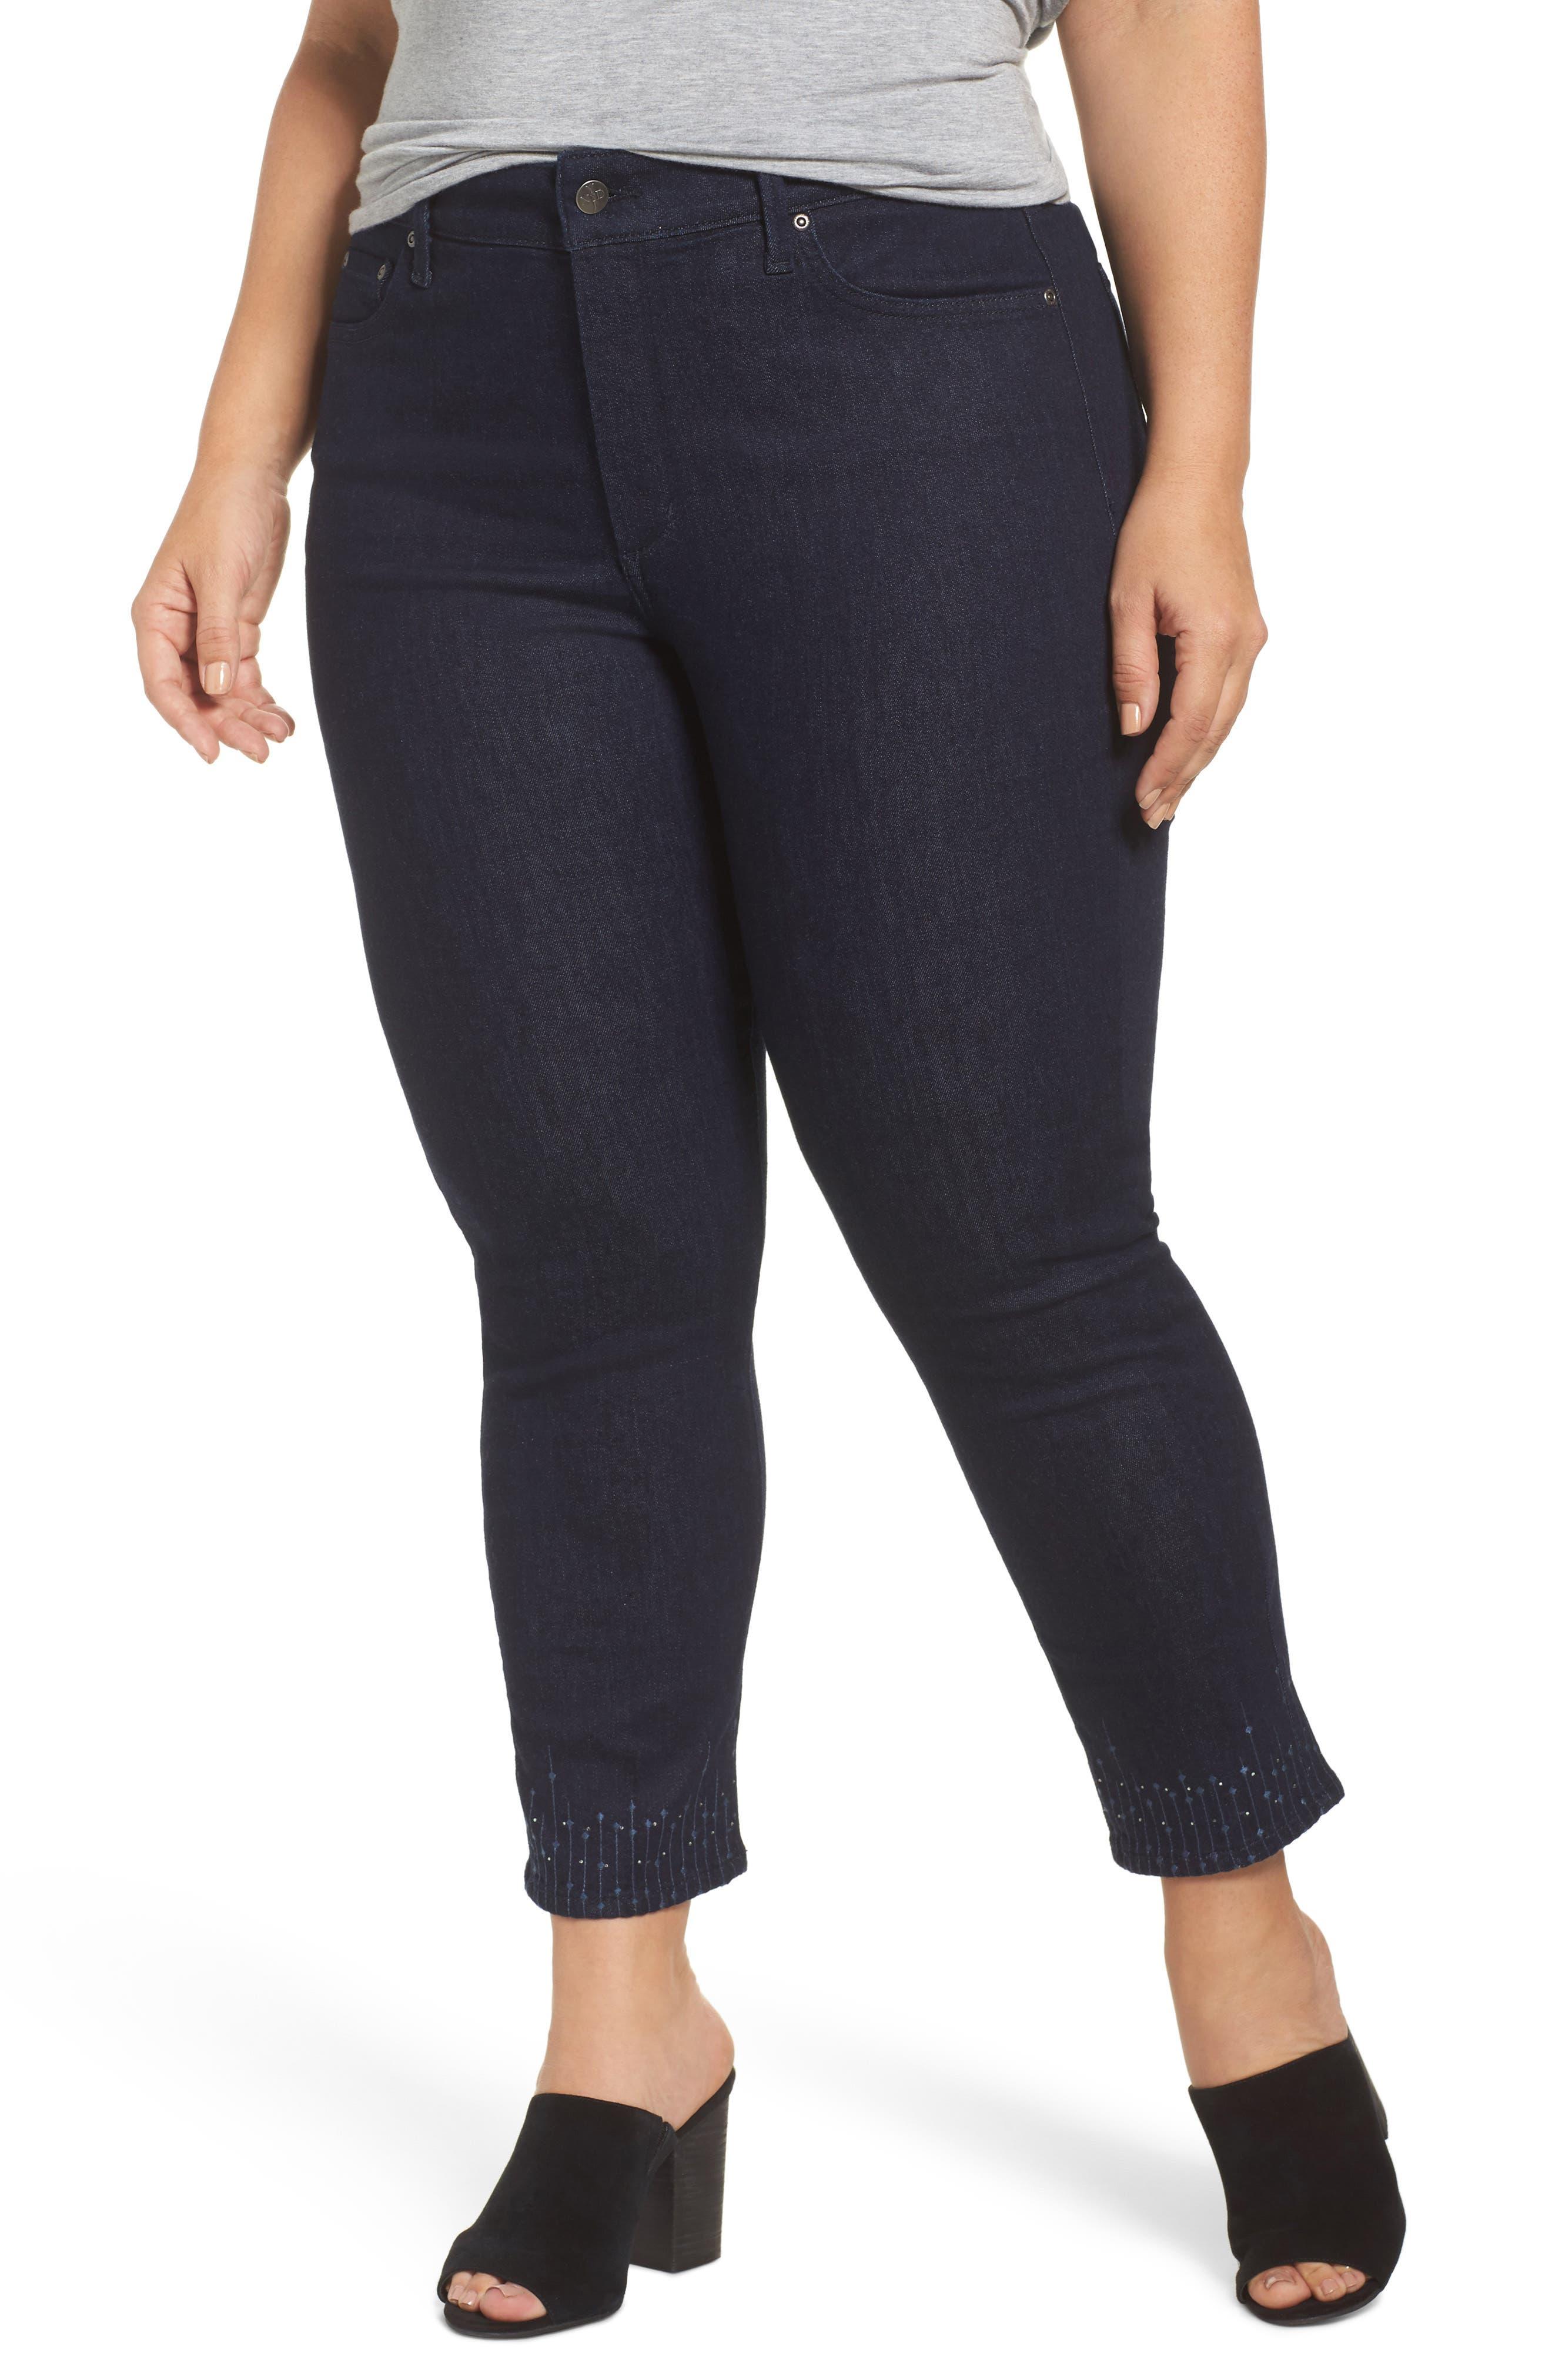 Alternate Image 1 Selected - NYDJ Sheri Bling Hem Stretch Ankle Skinny Jeans (Plus Size)